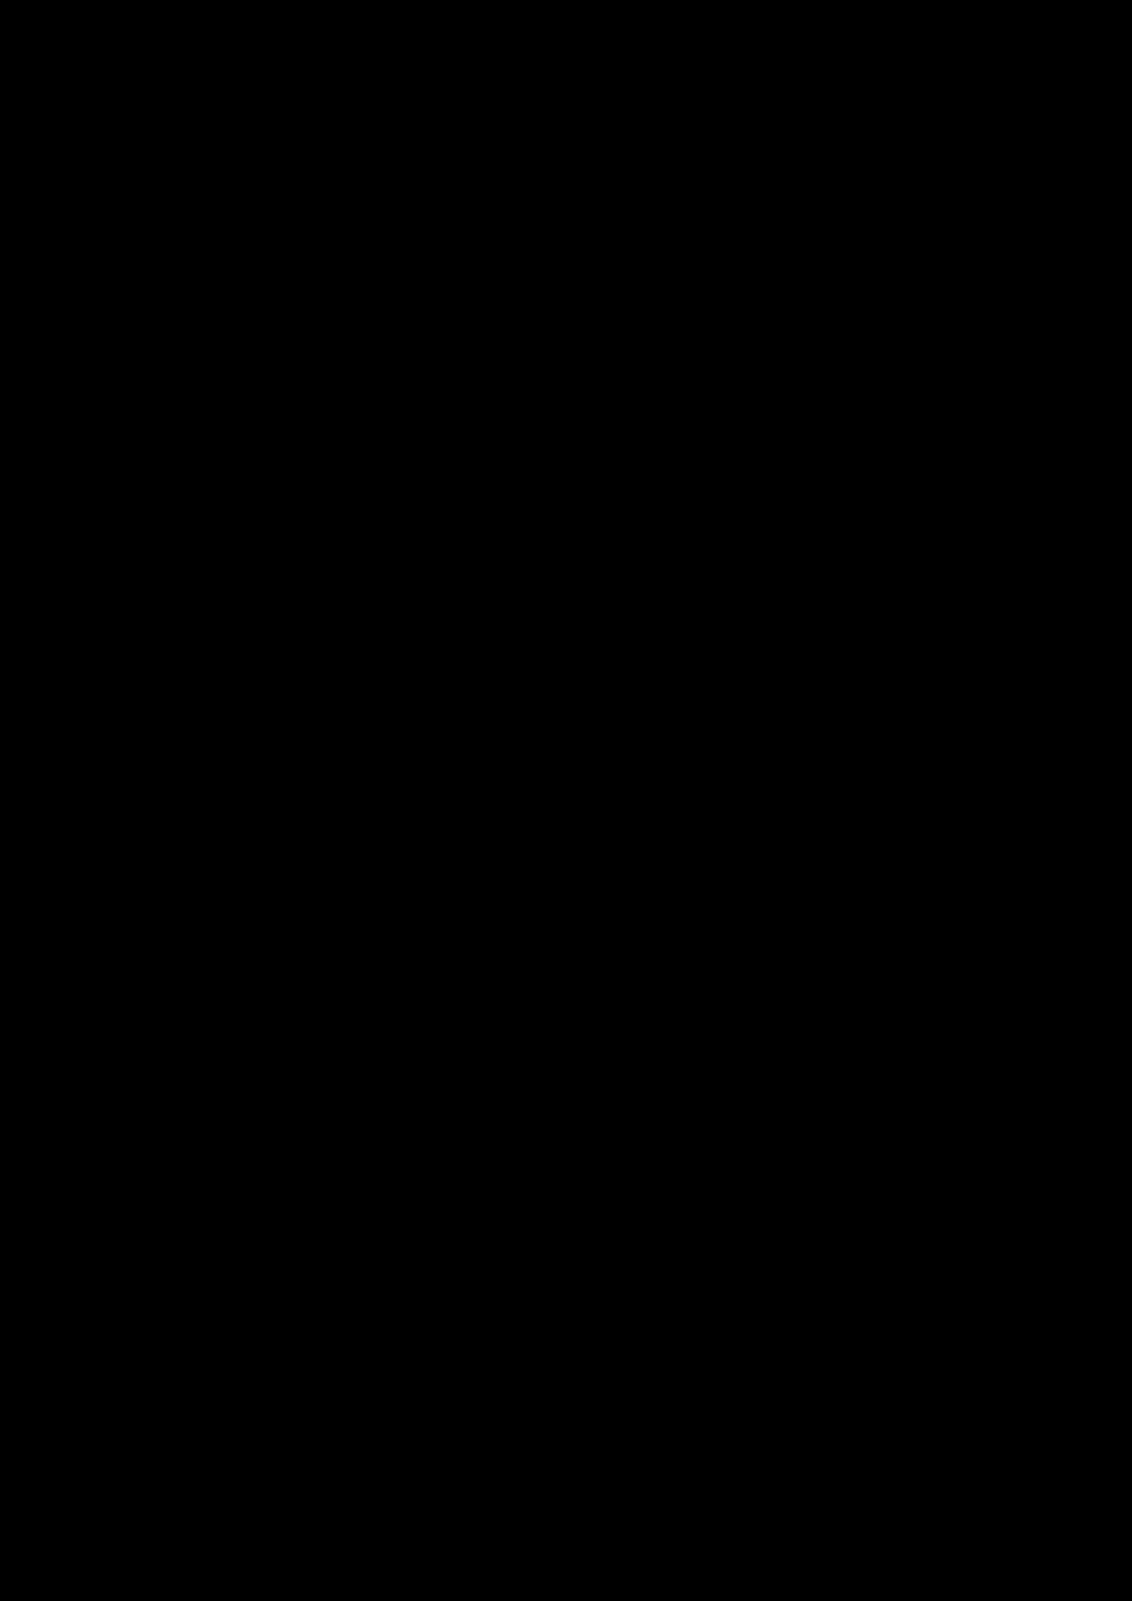 Belyiy sokol slide, Image 39